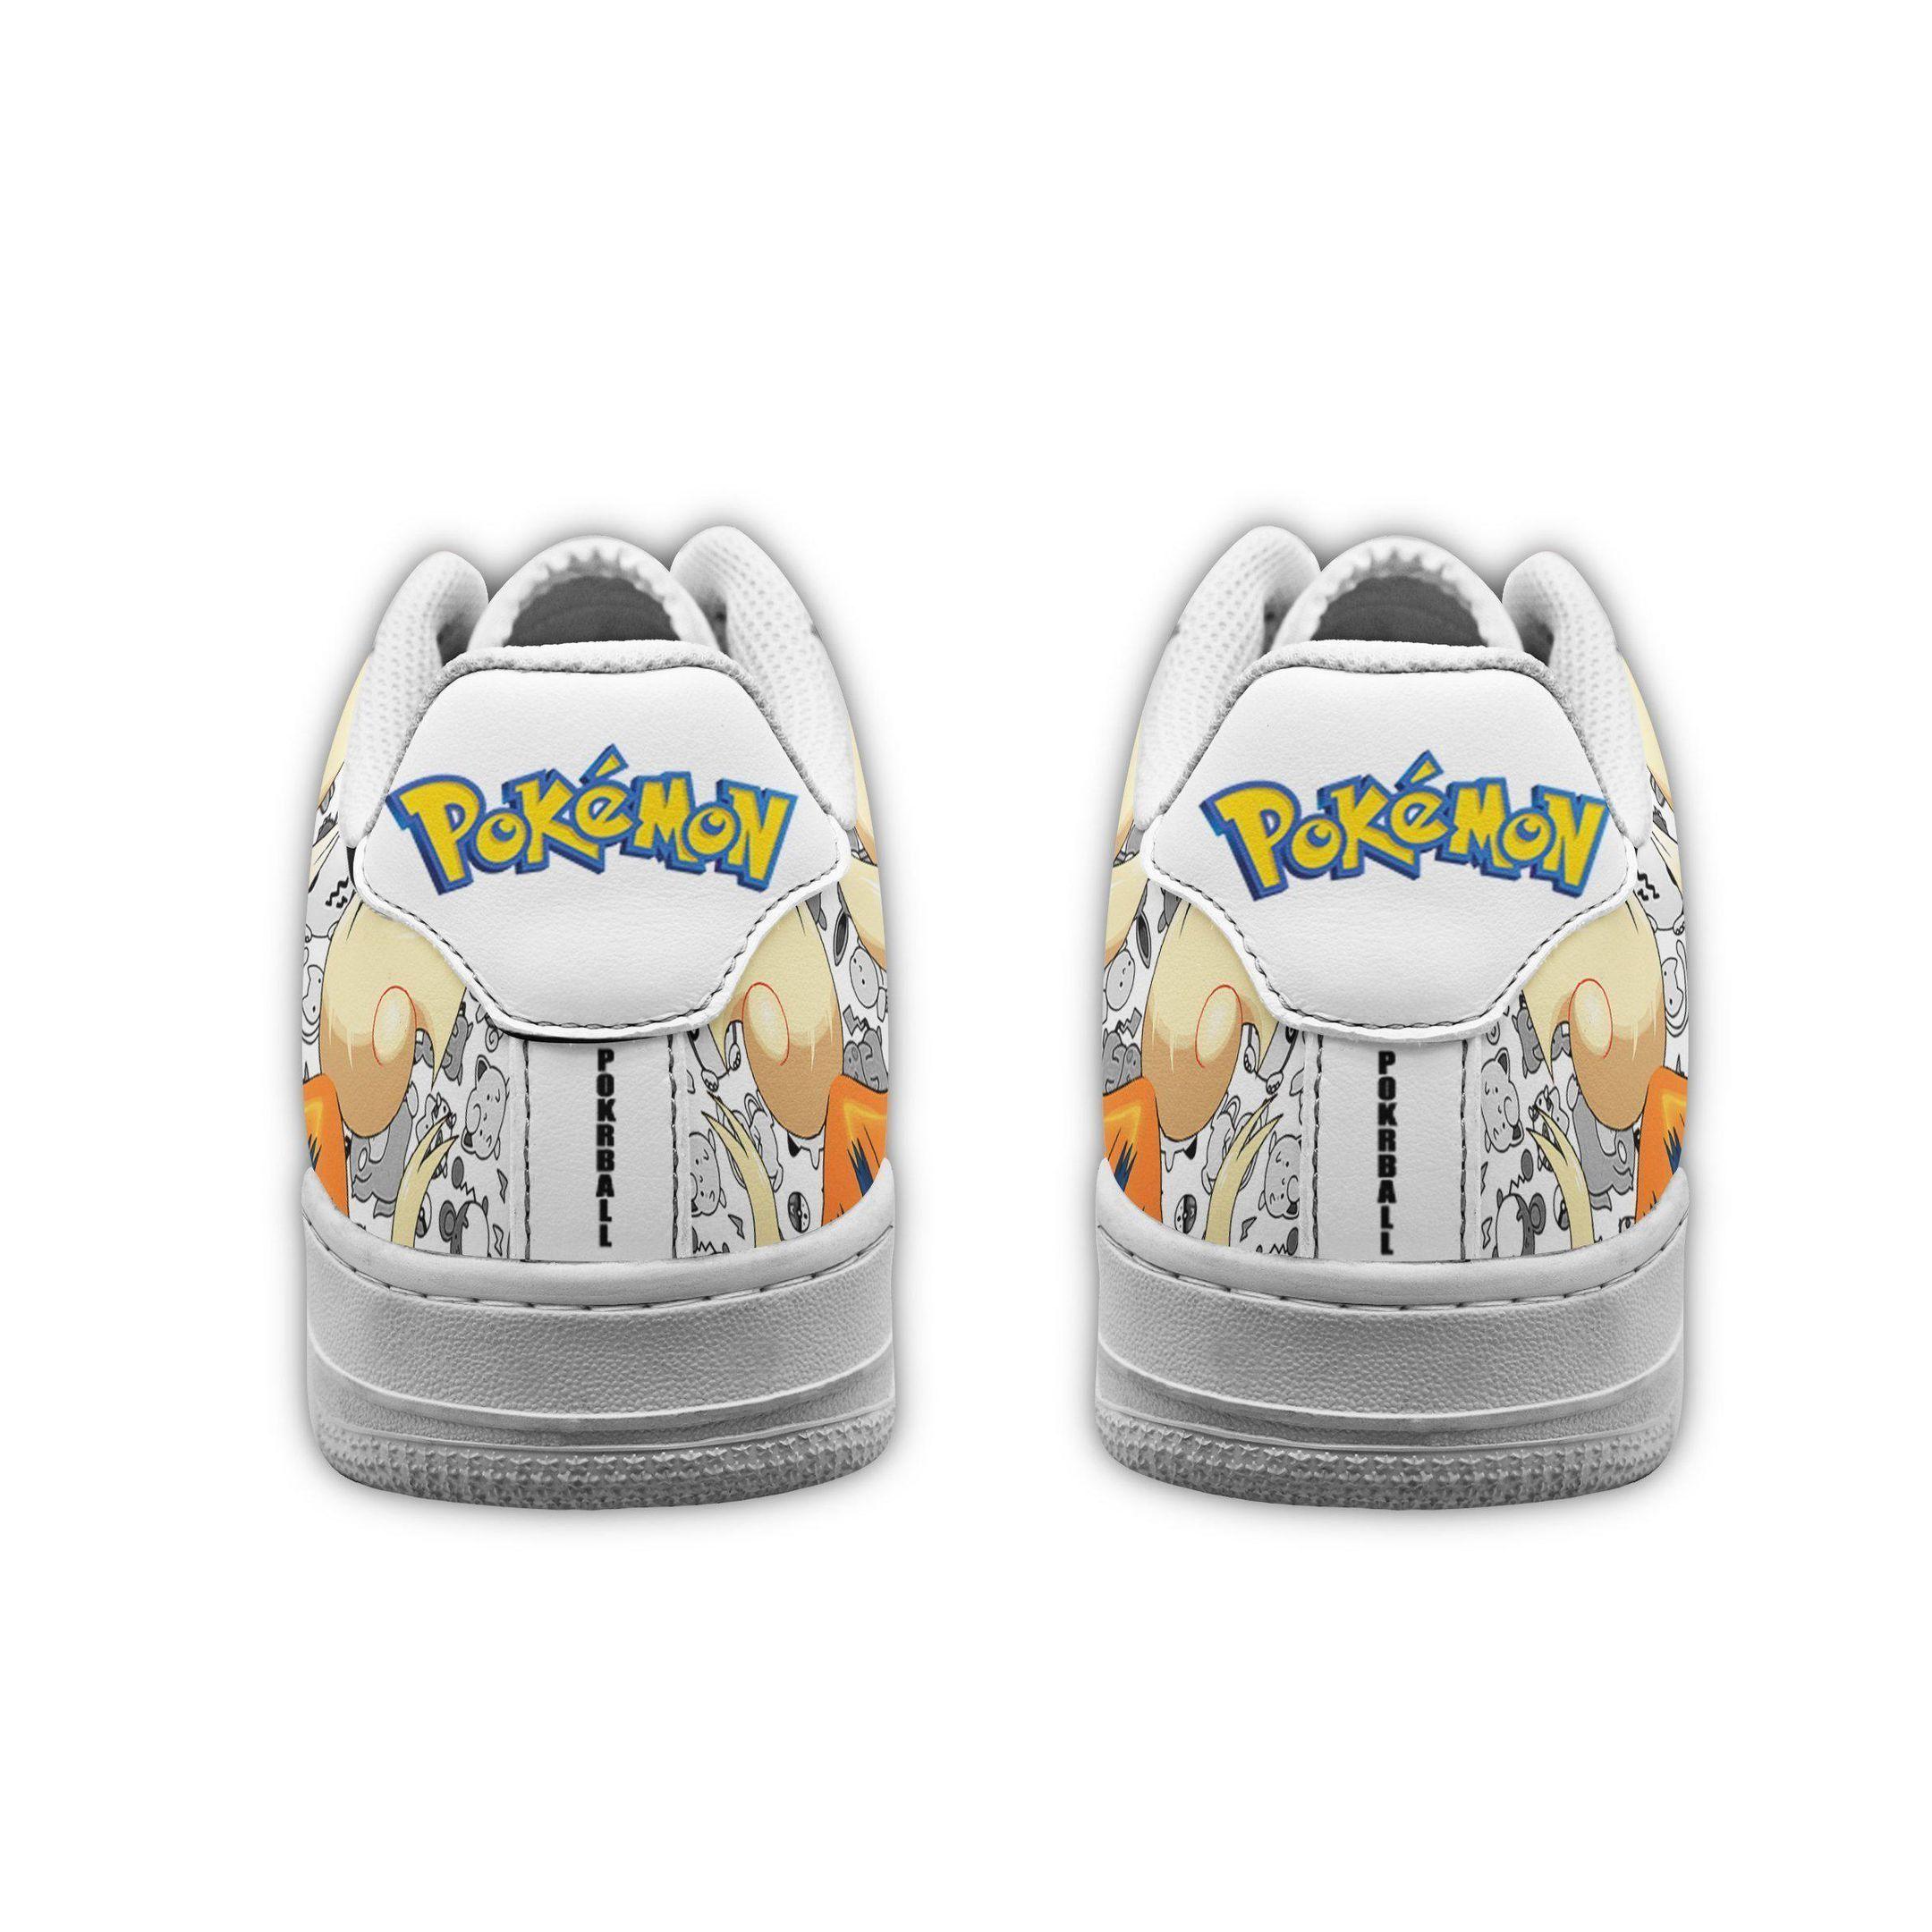 Arcanine Air Shoes Pokemon Shoes Fan Gift Idea GO1012